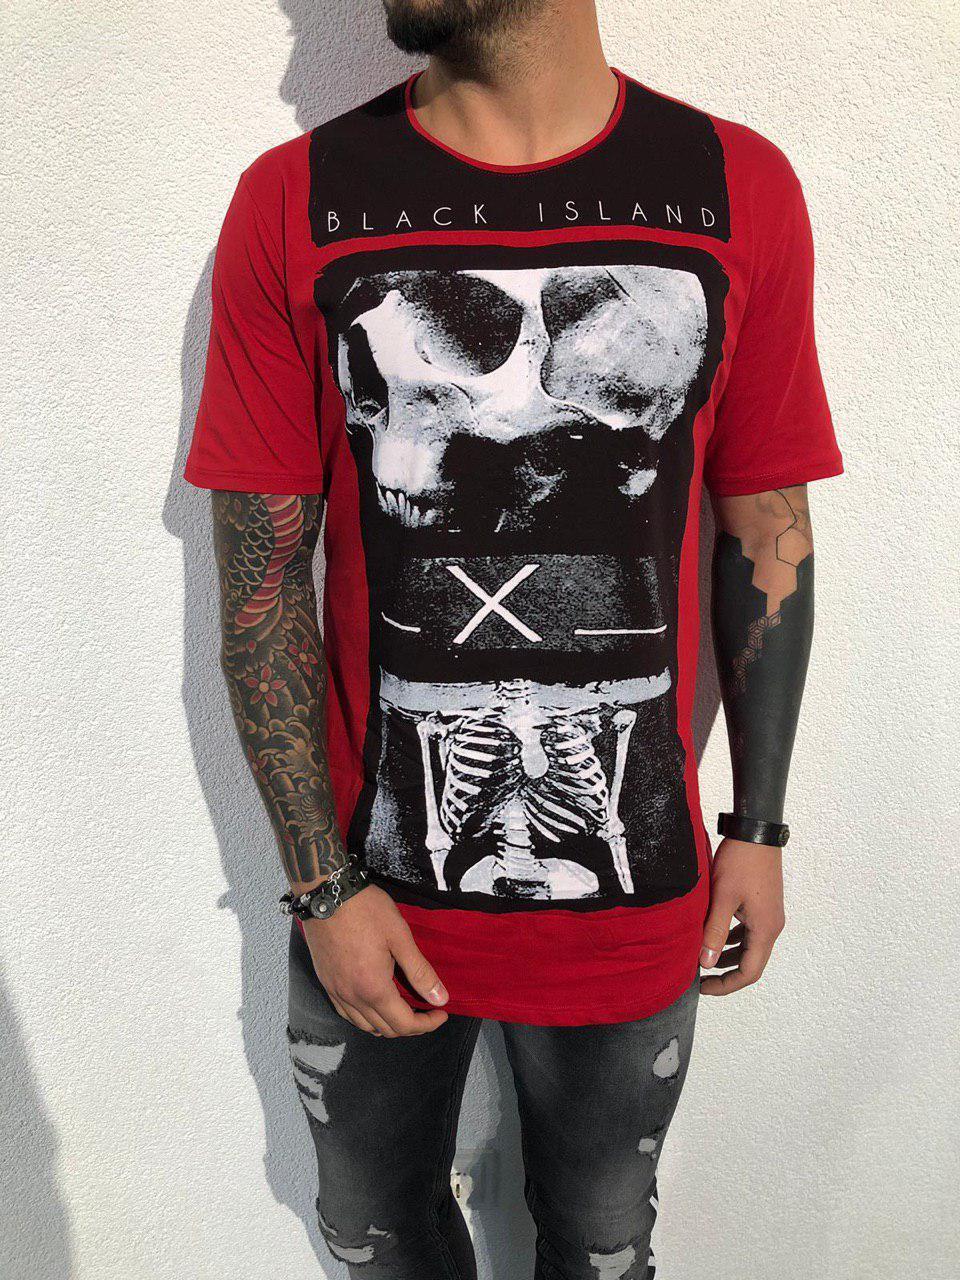 a0a8bfed1d00 Мужская футболка Black Island ADA1916 красная - Компания